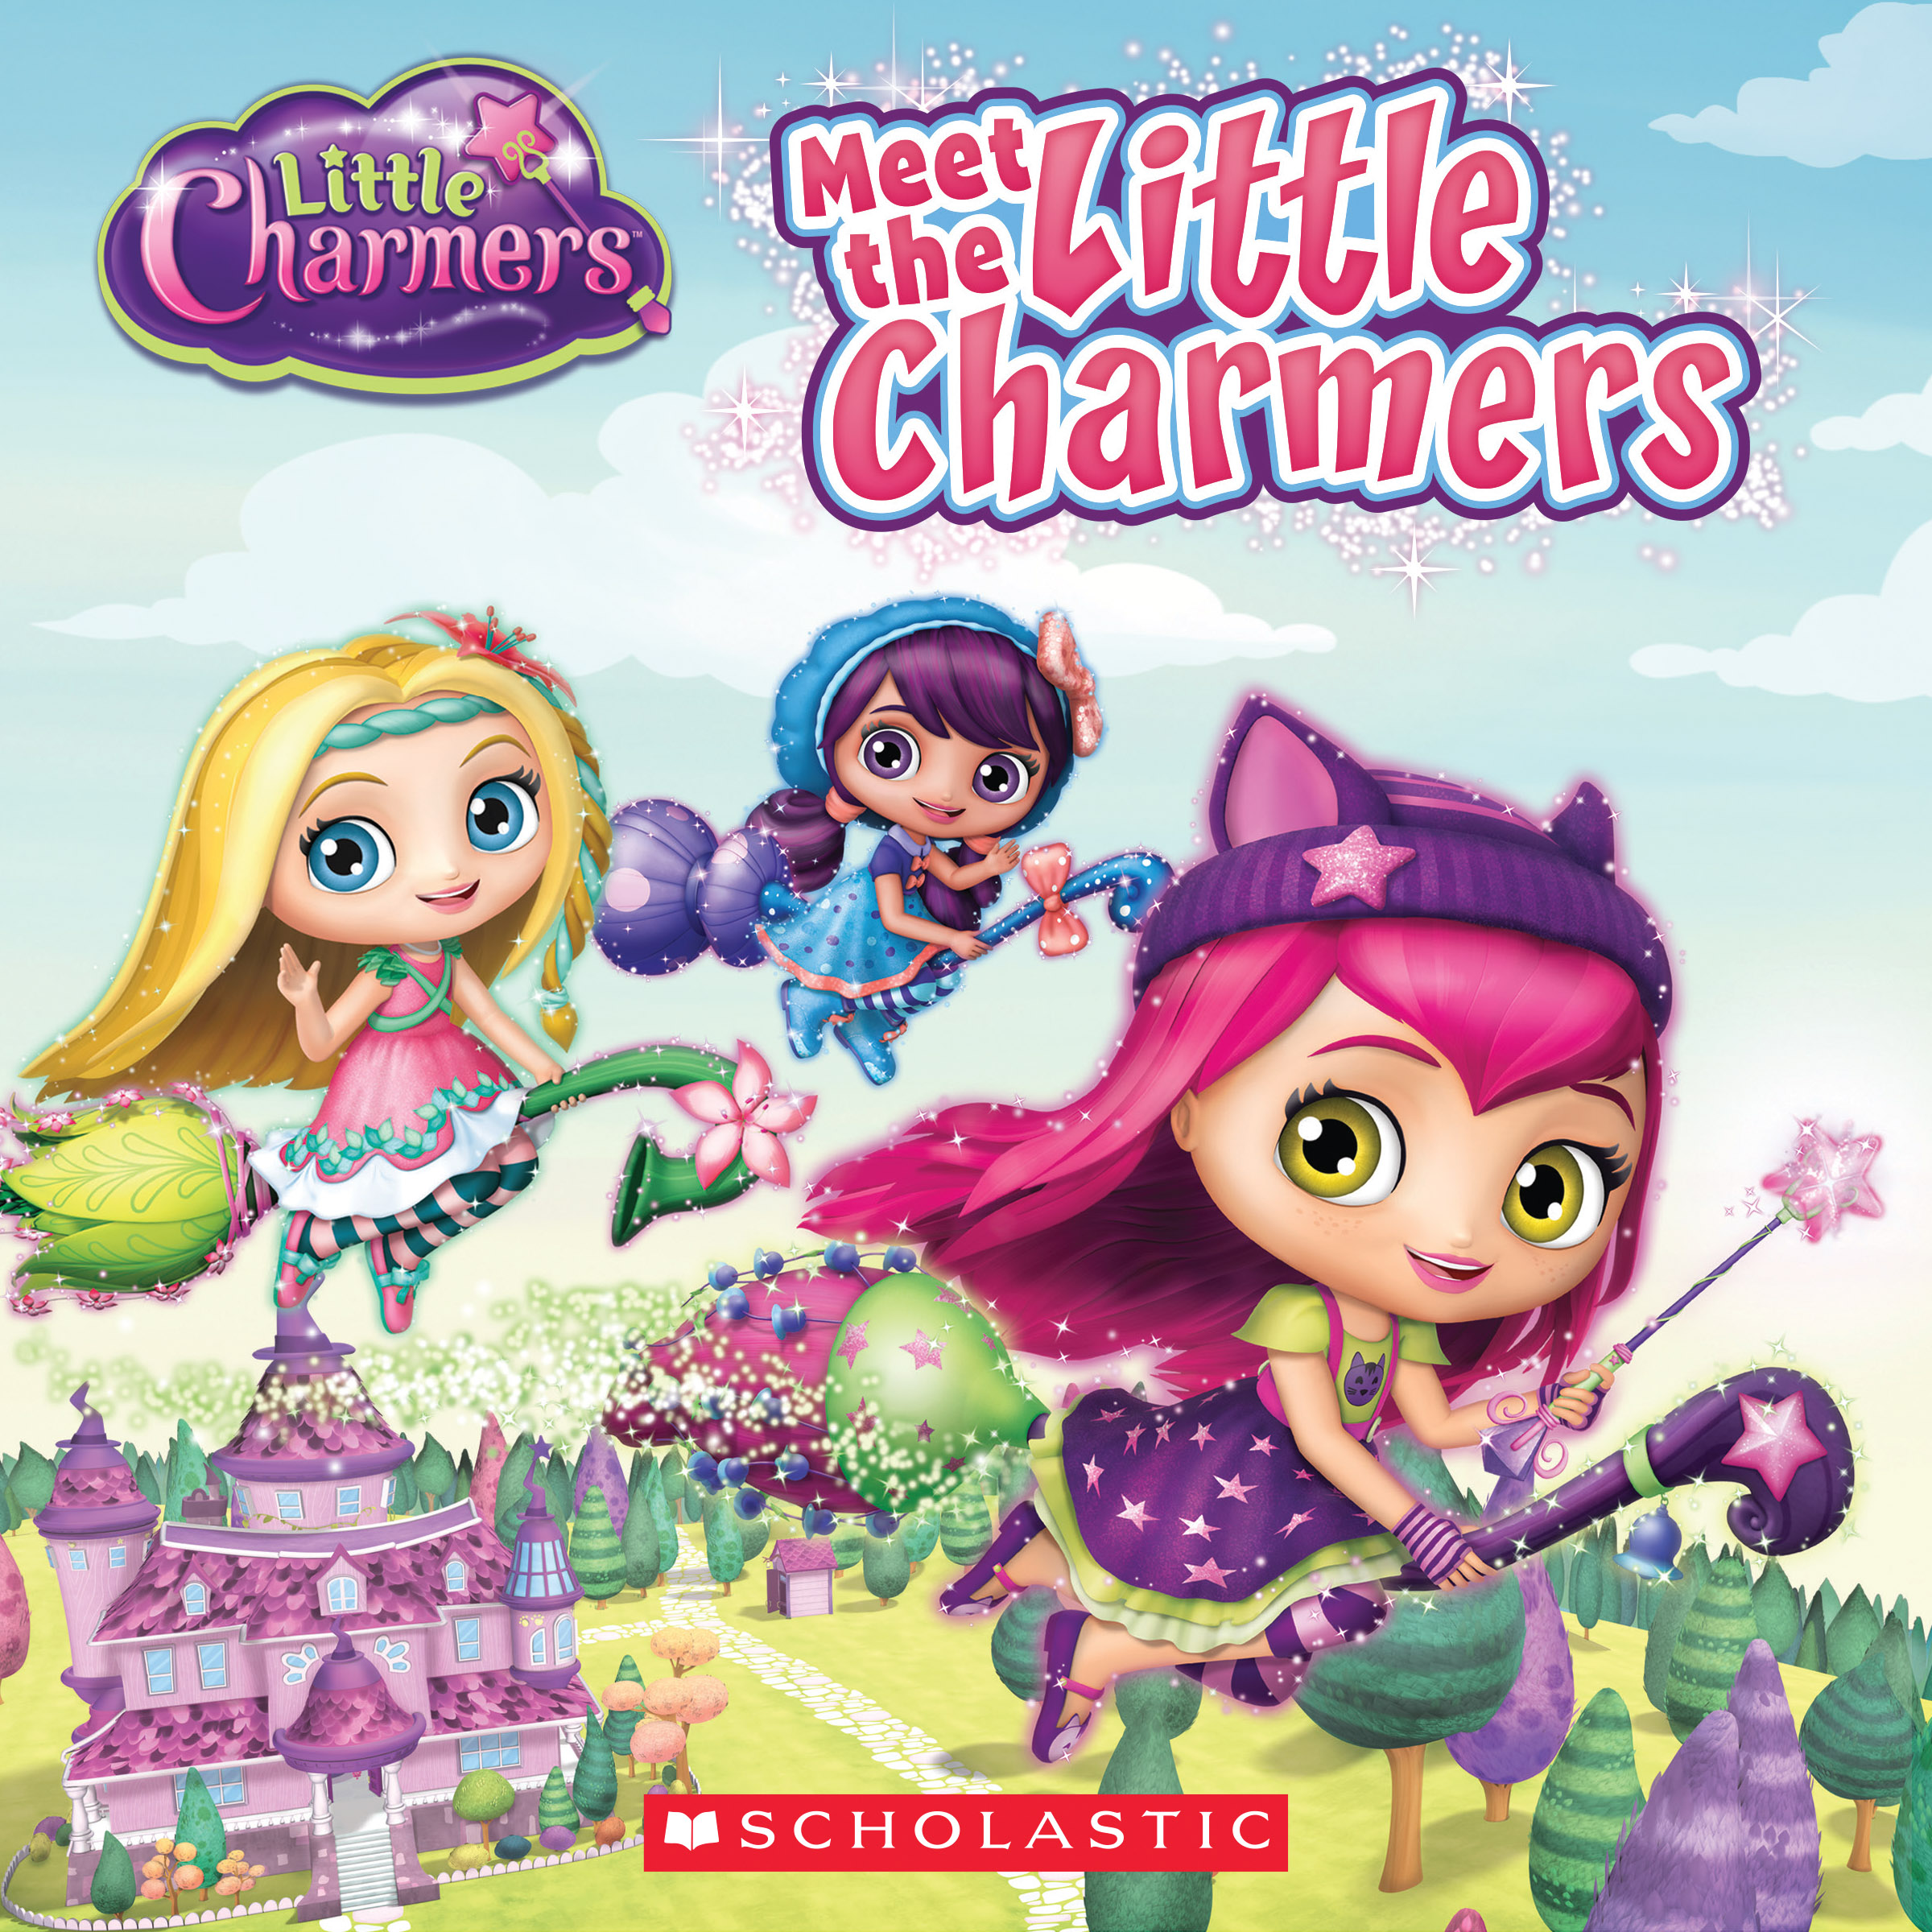 Little Charmers: Meet The Little Charmers